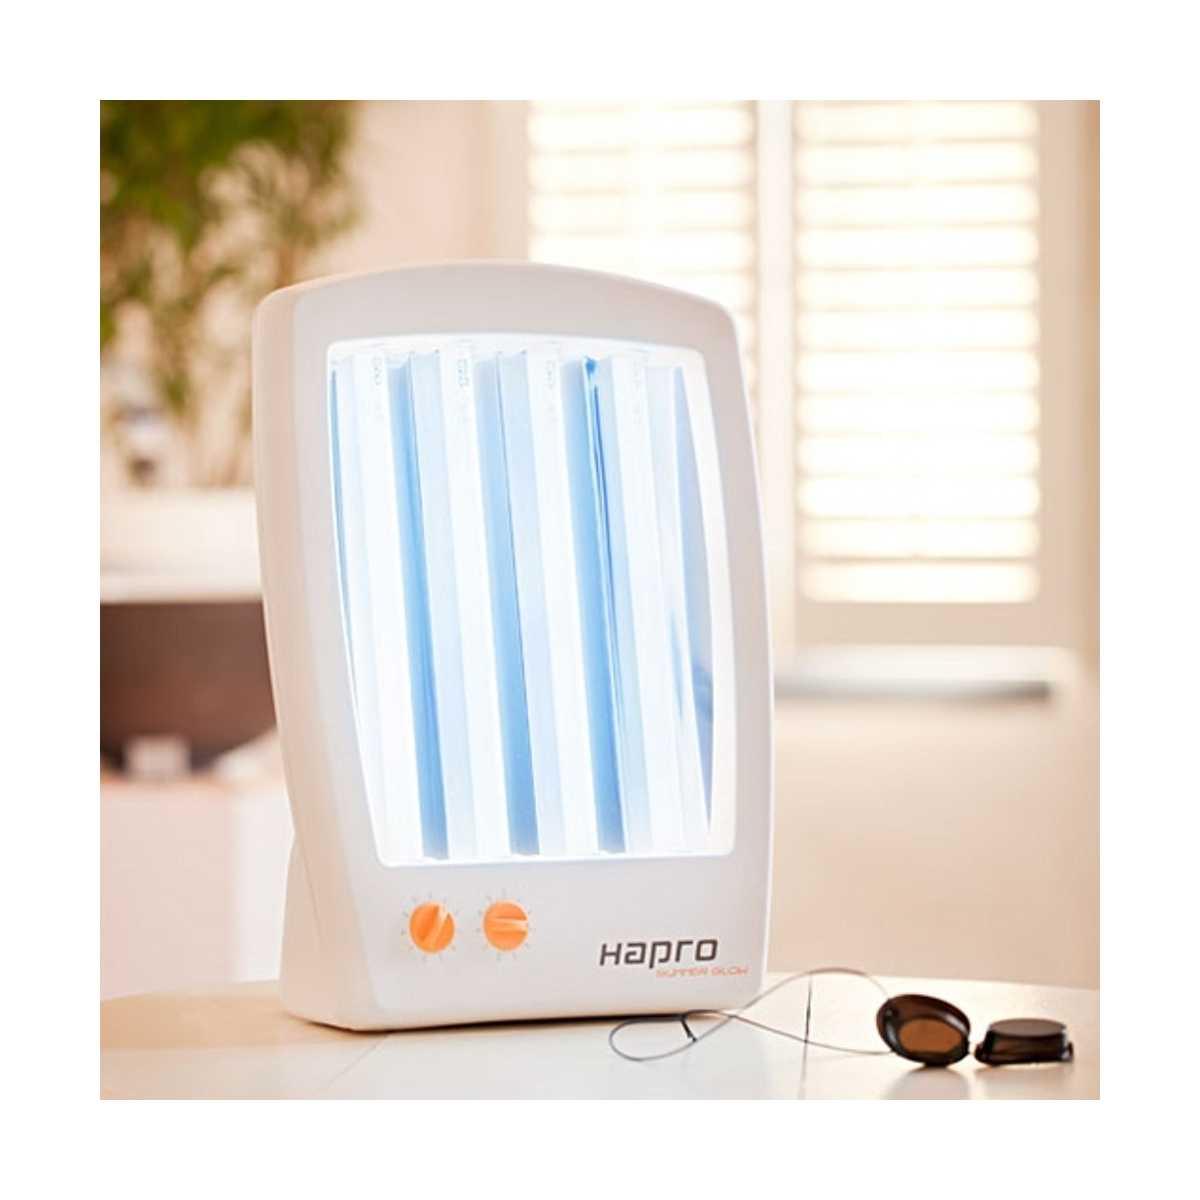 Hapro HB175 Solarium facial home - Home Tanning - Hapro